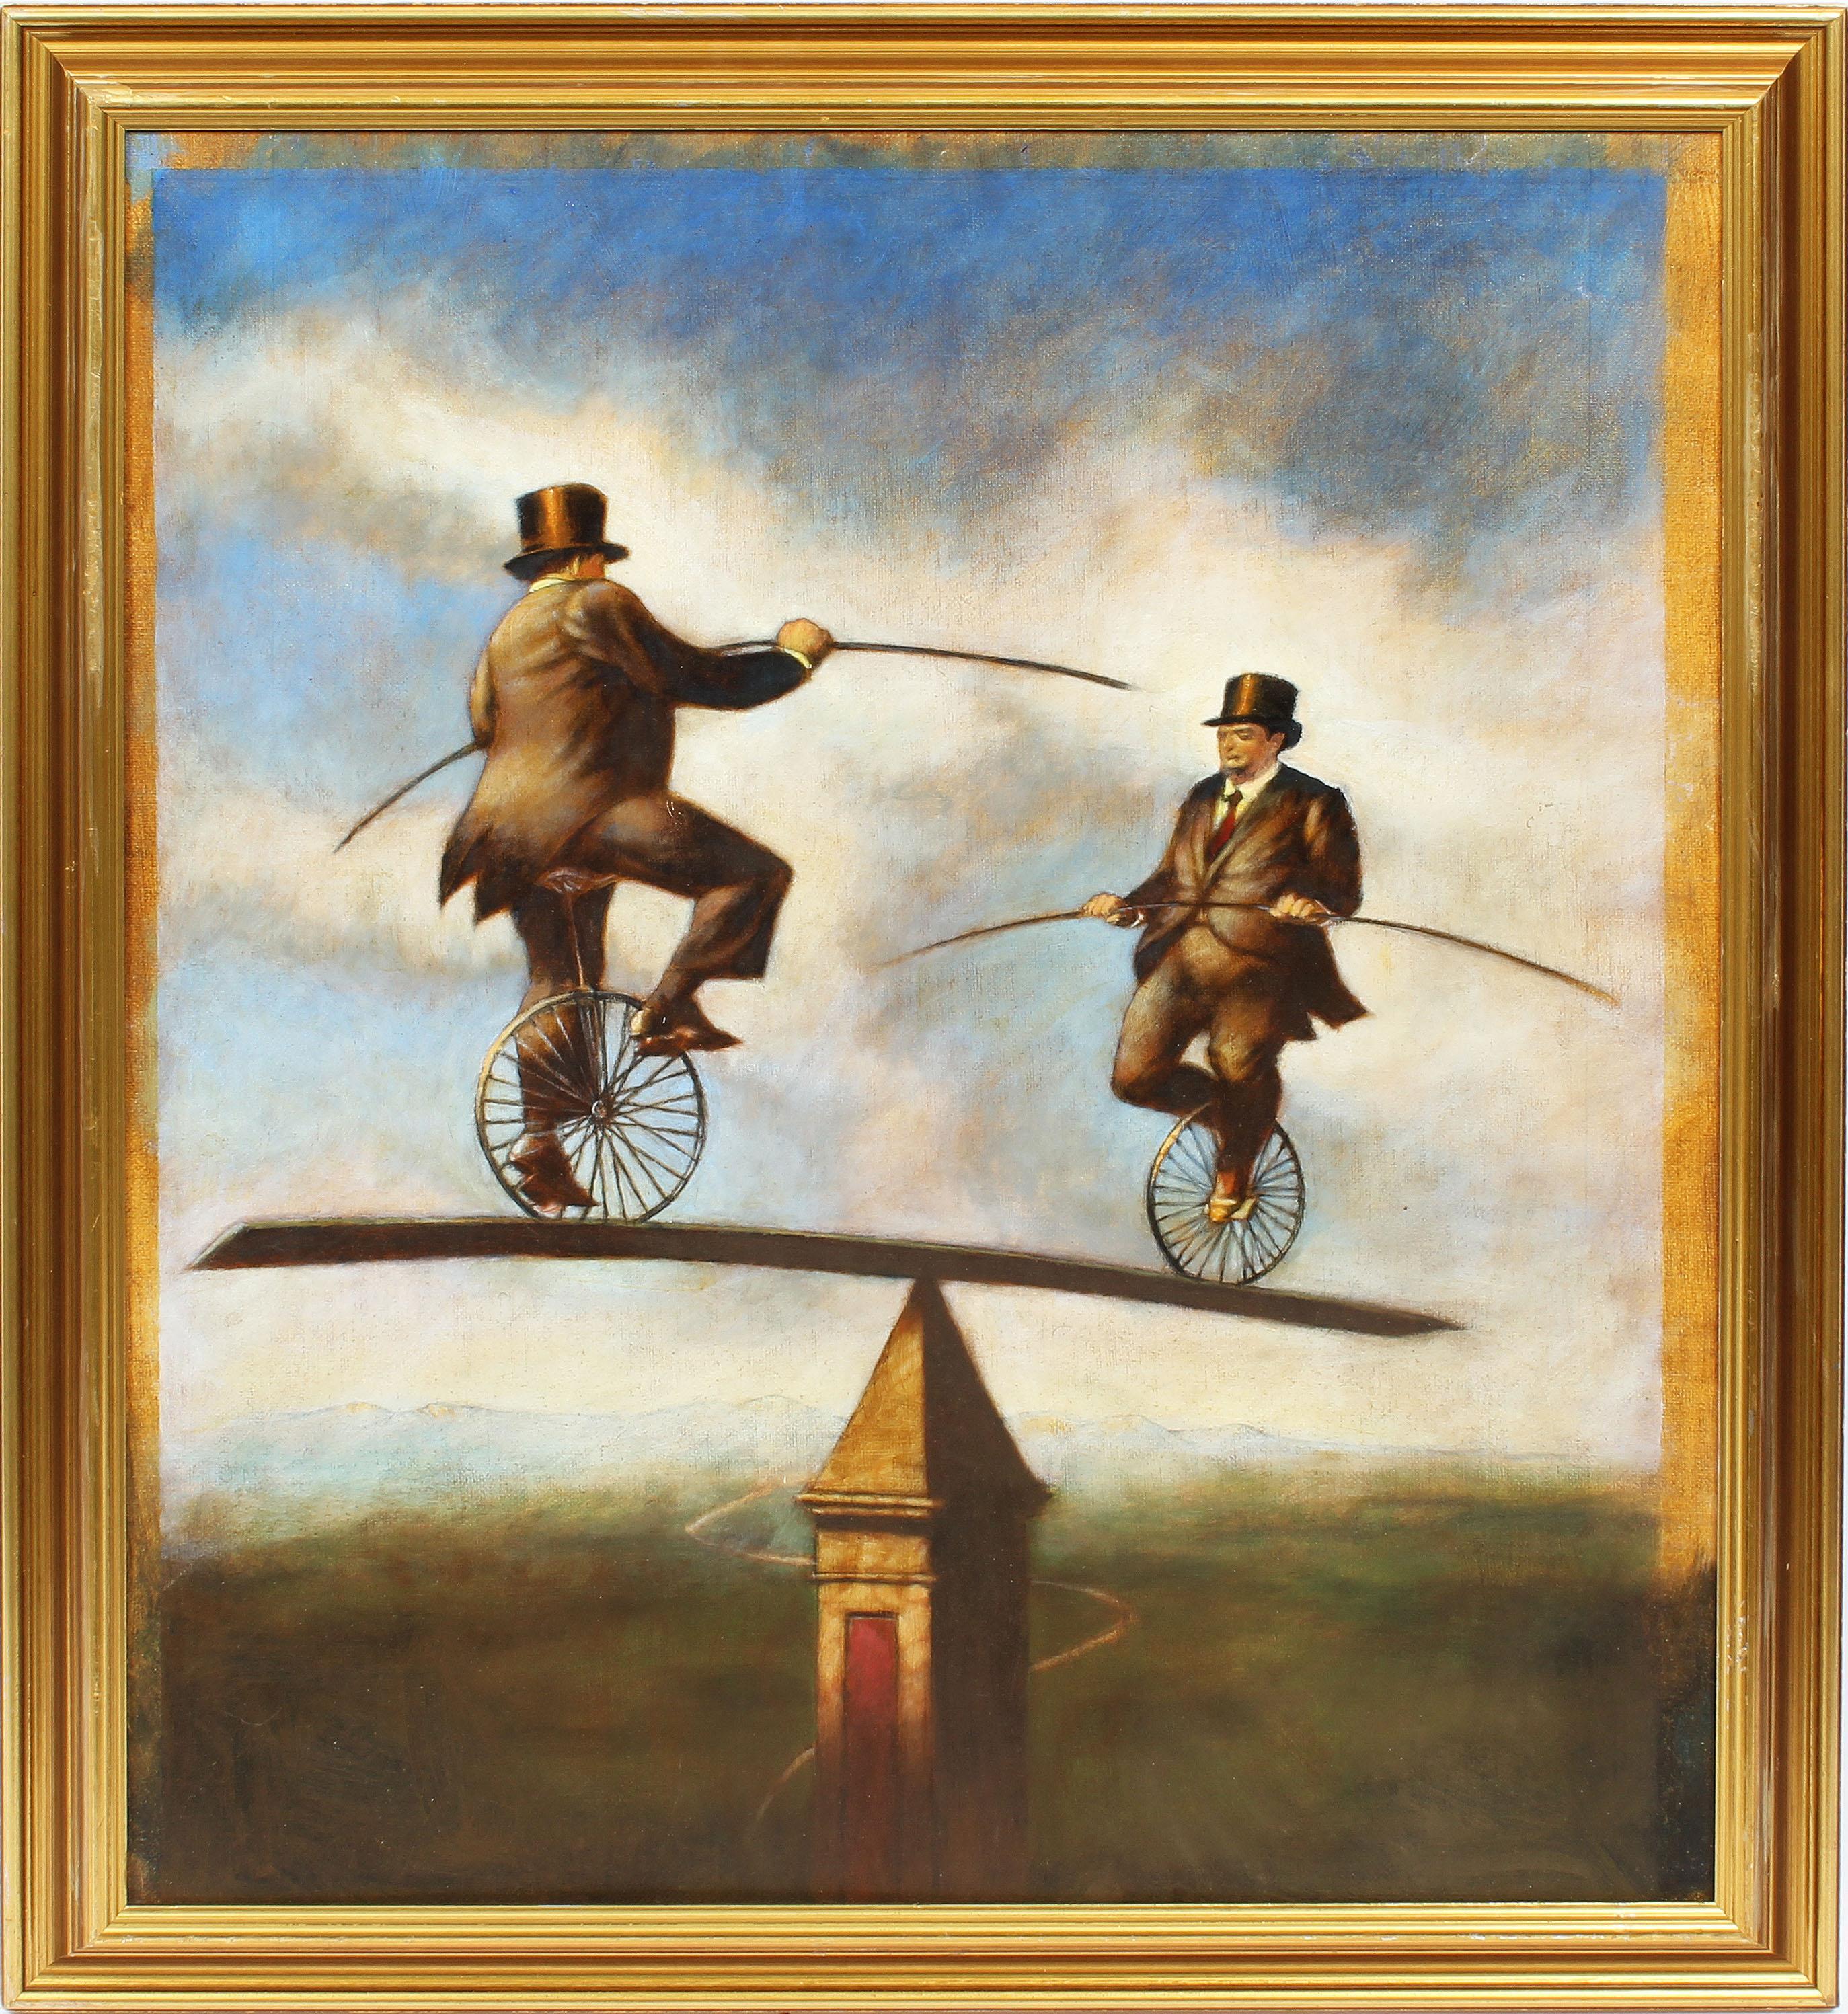 Antique American Surreal Bike Riding Fantasy Landscape Signed Original Painting